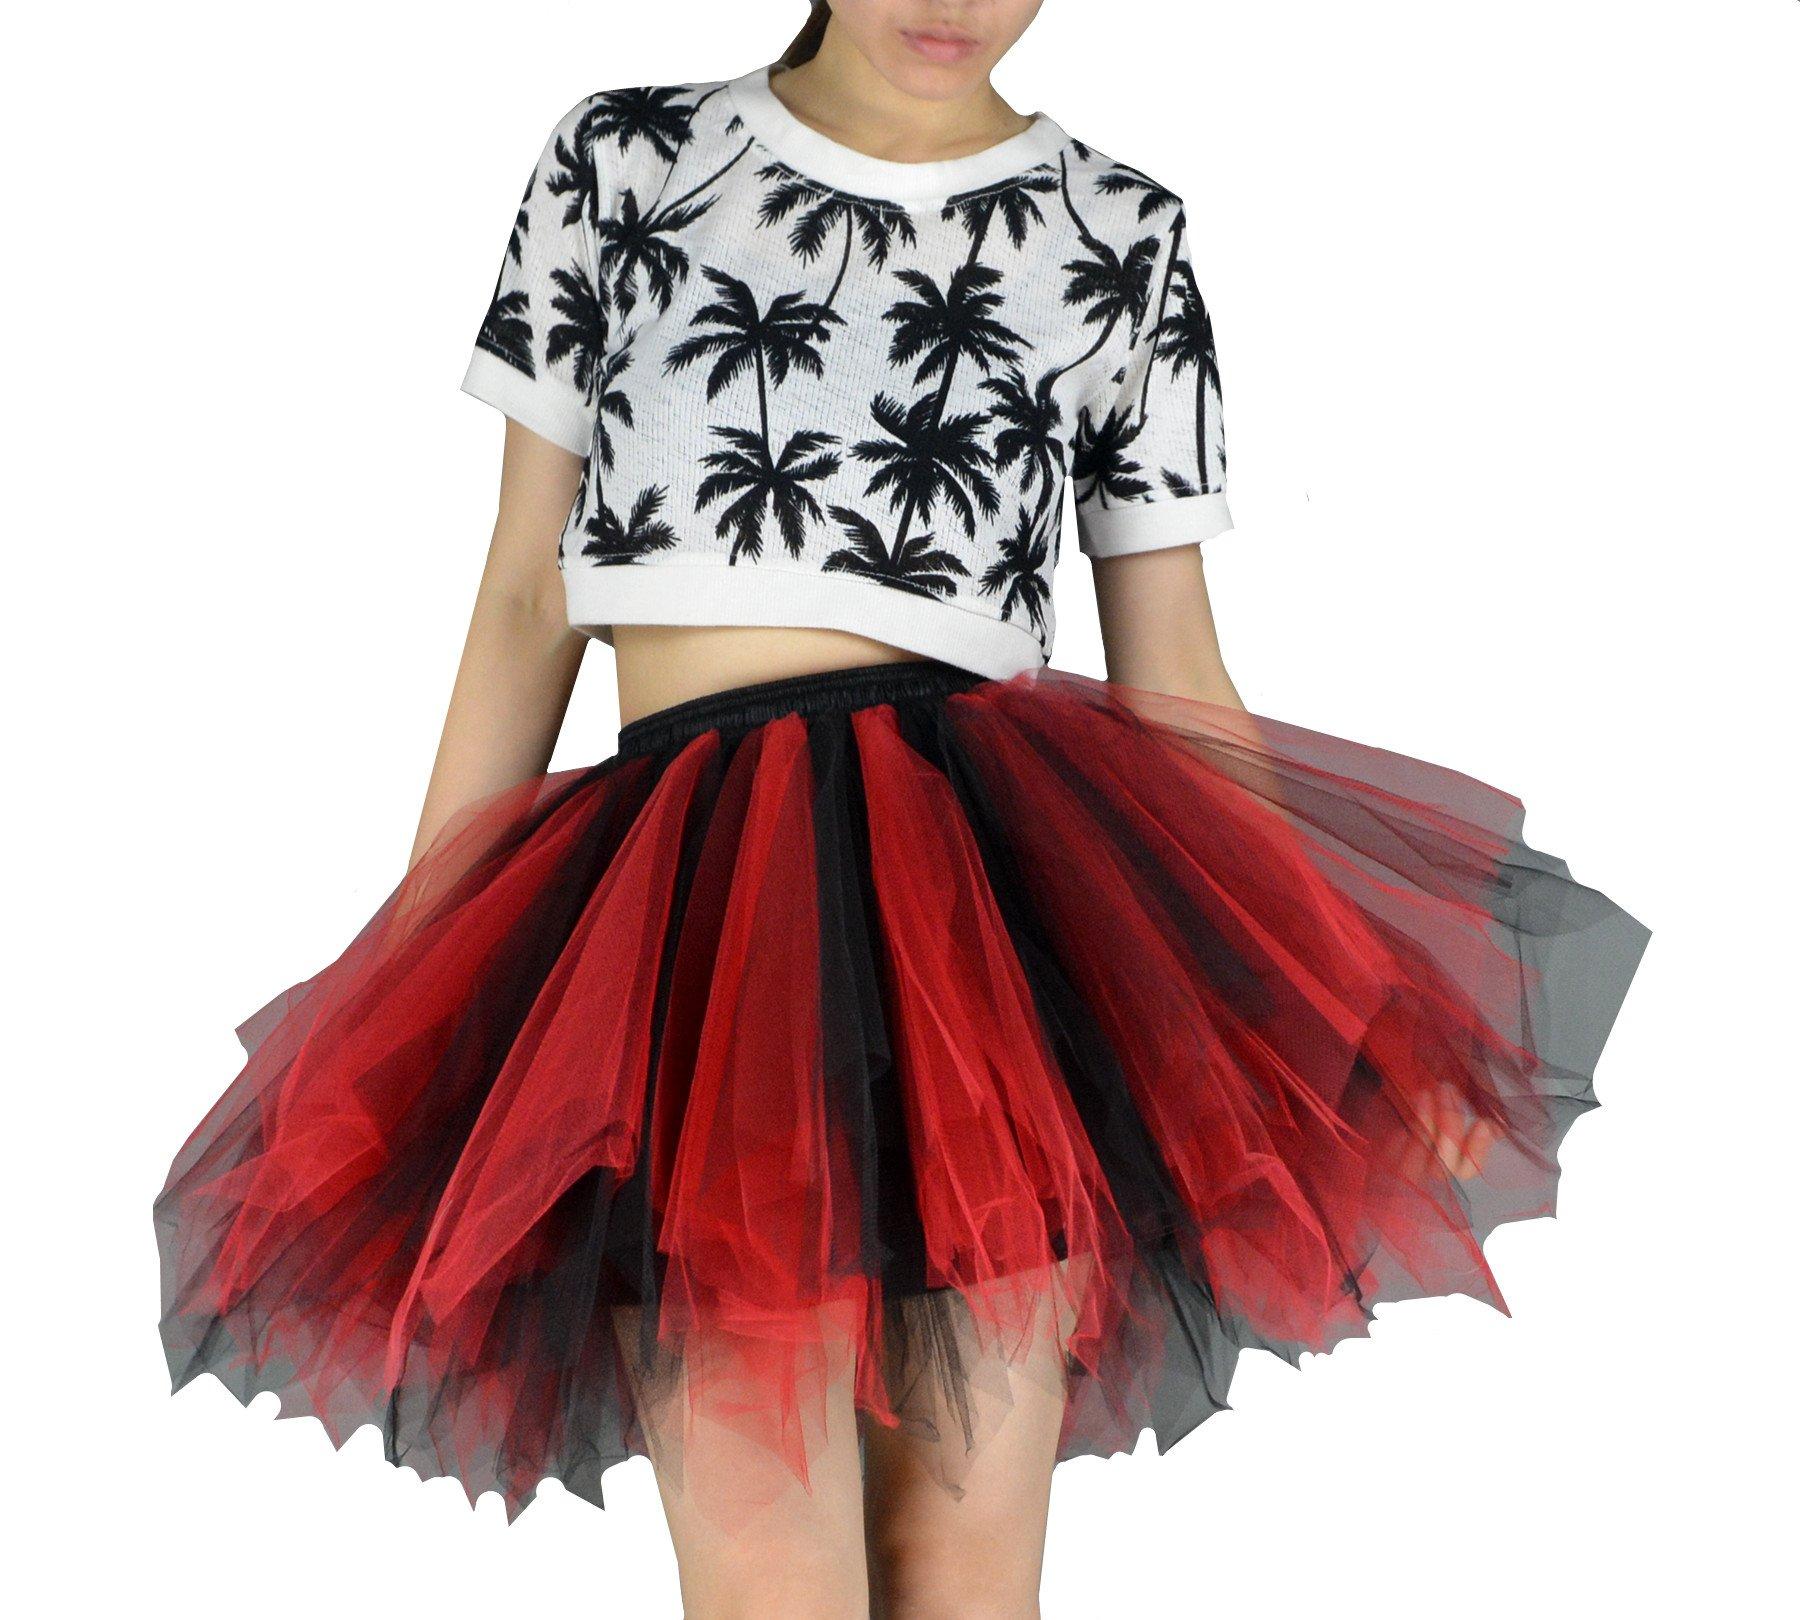 YSJERA Women's Tutu Tulle Mini A-Line Petticoat Prom Party Cosplay Skirt Fun Skirts (L, Black+Red)